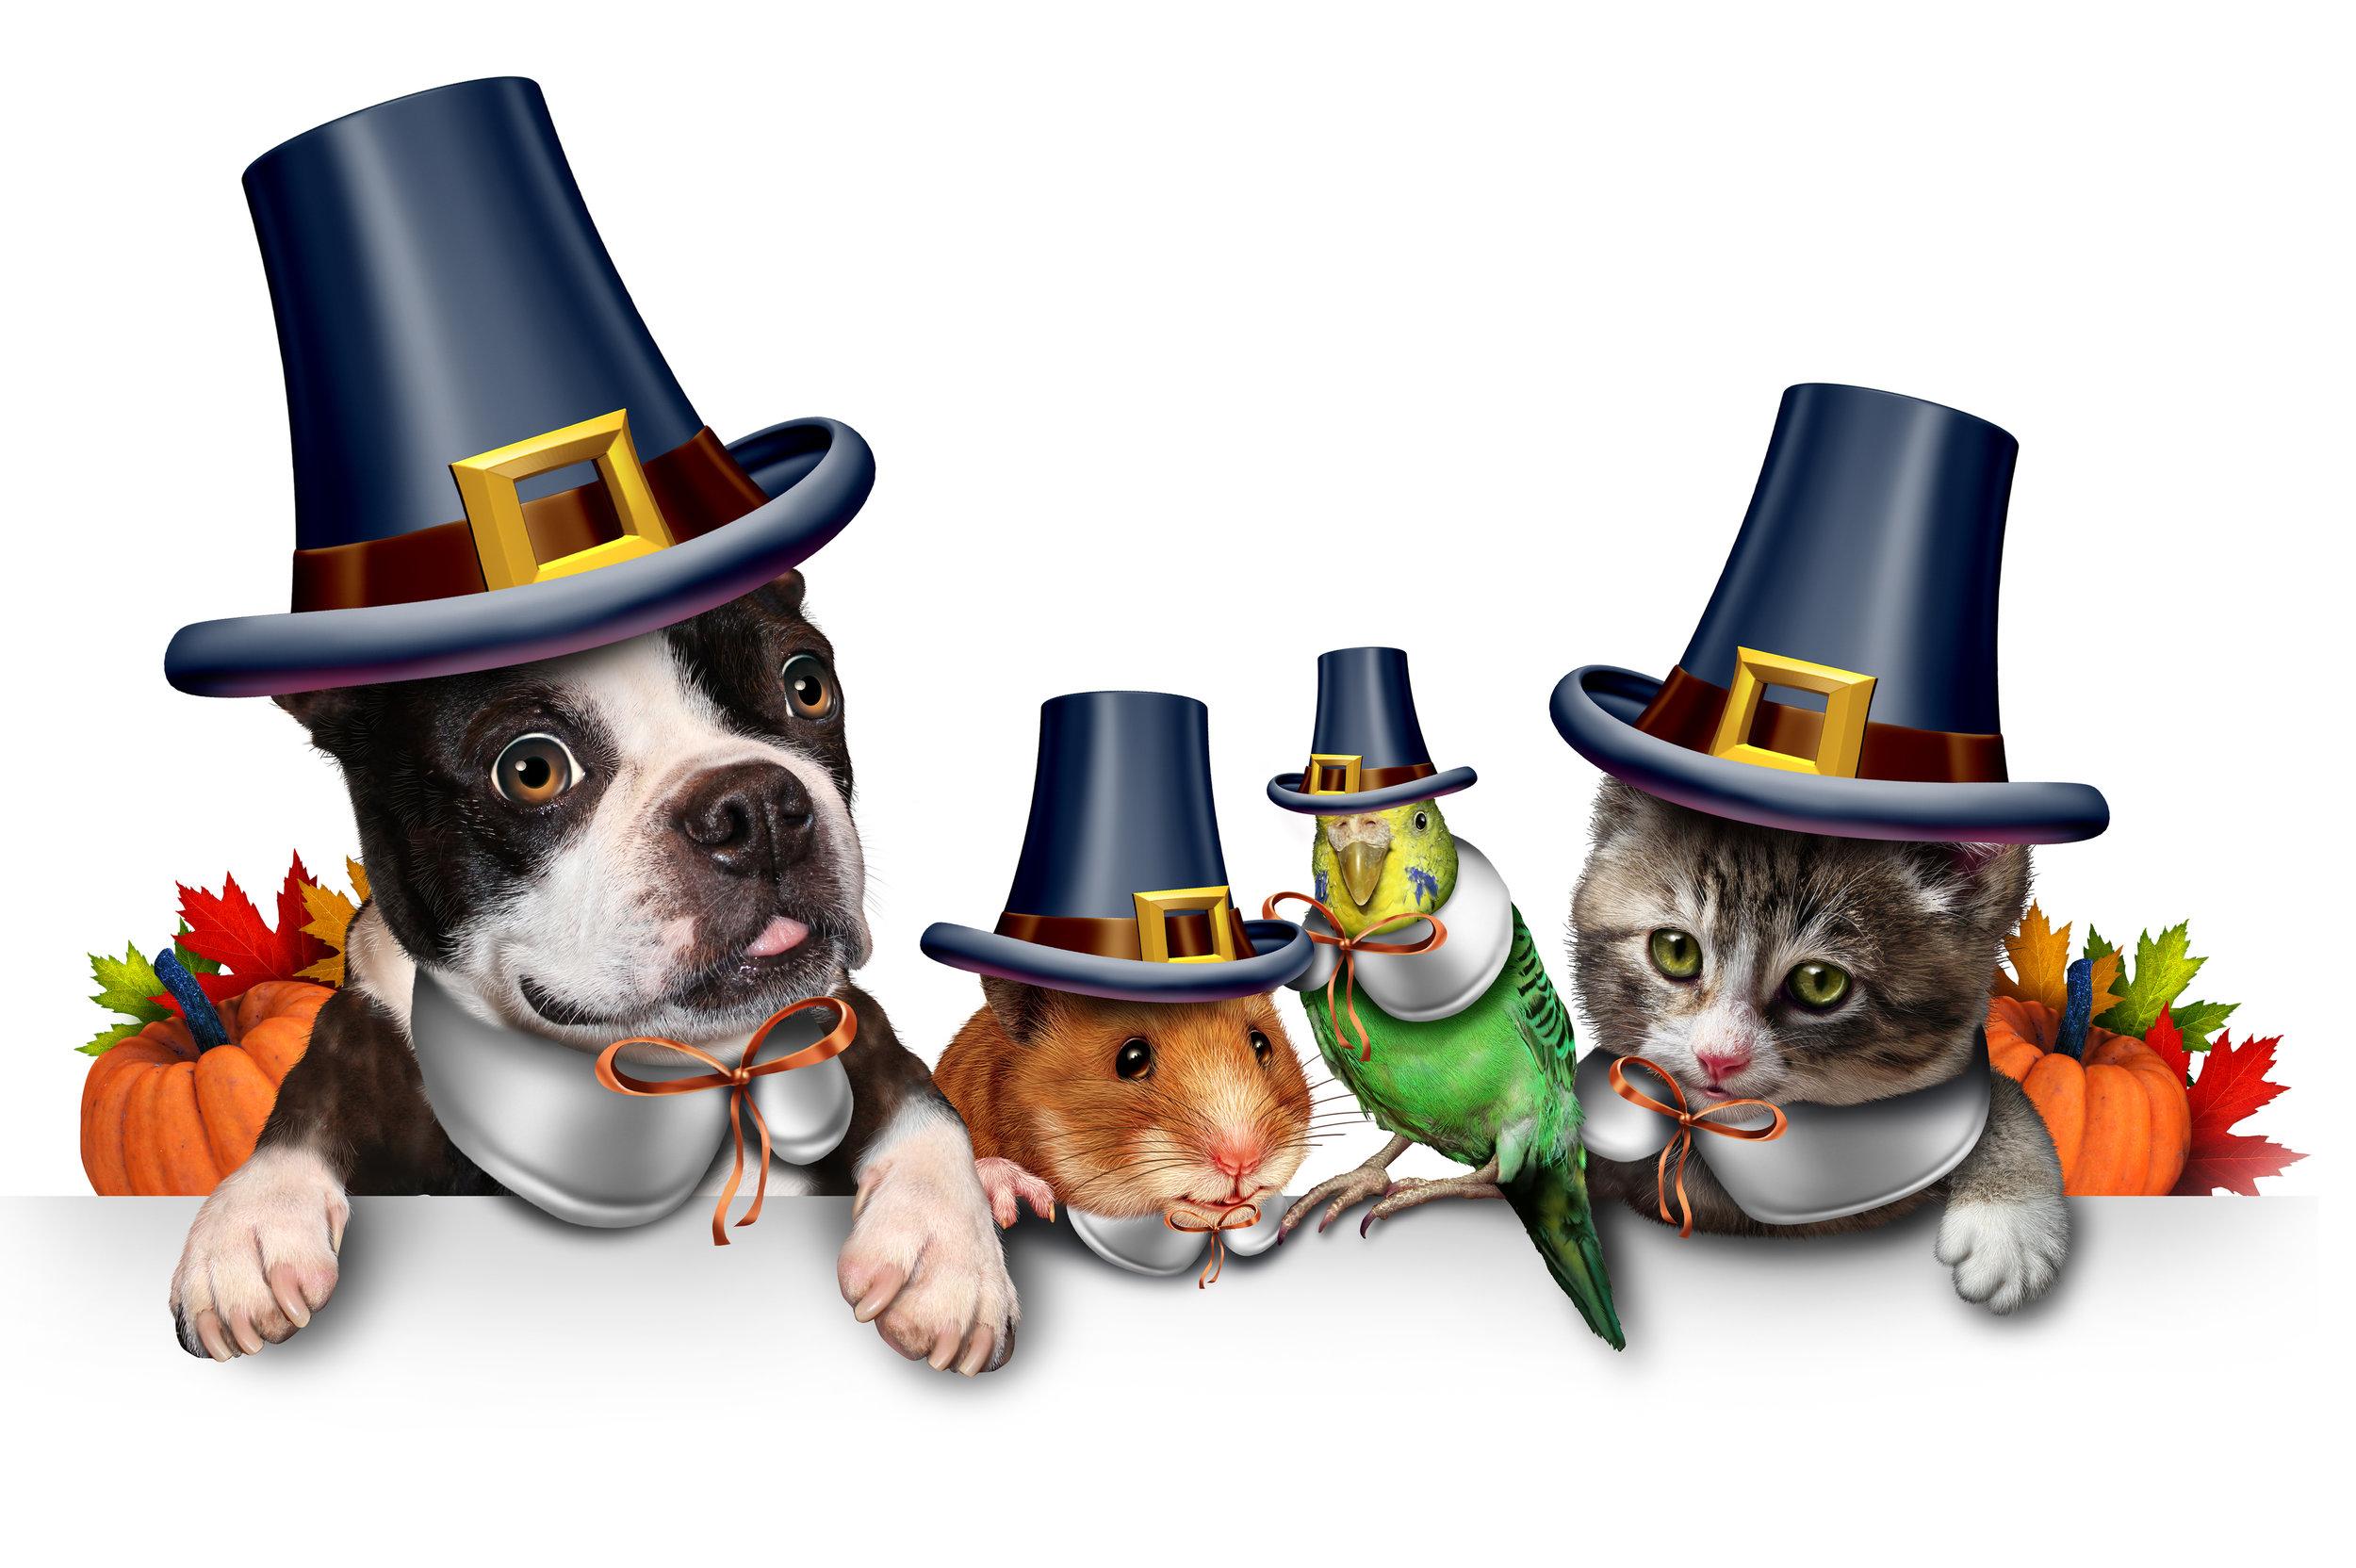 pets on thanksgiving - nov 21, 2018.jpg